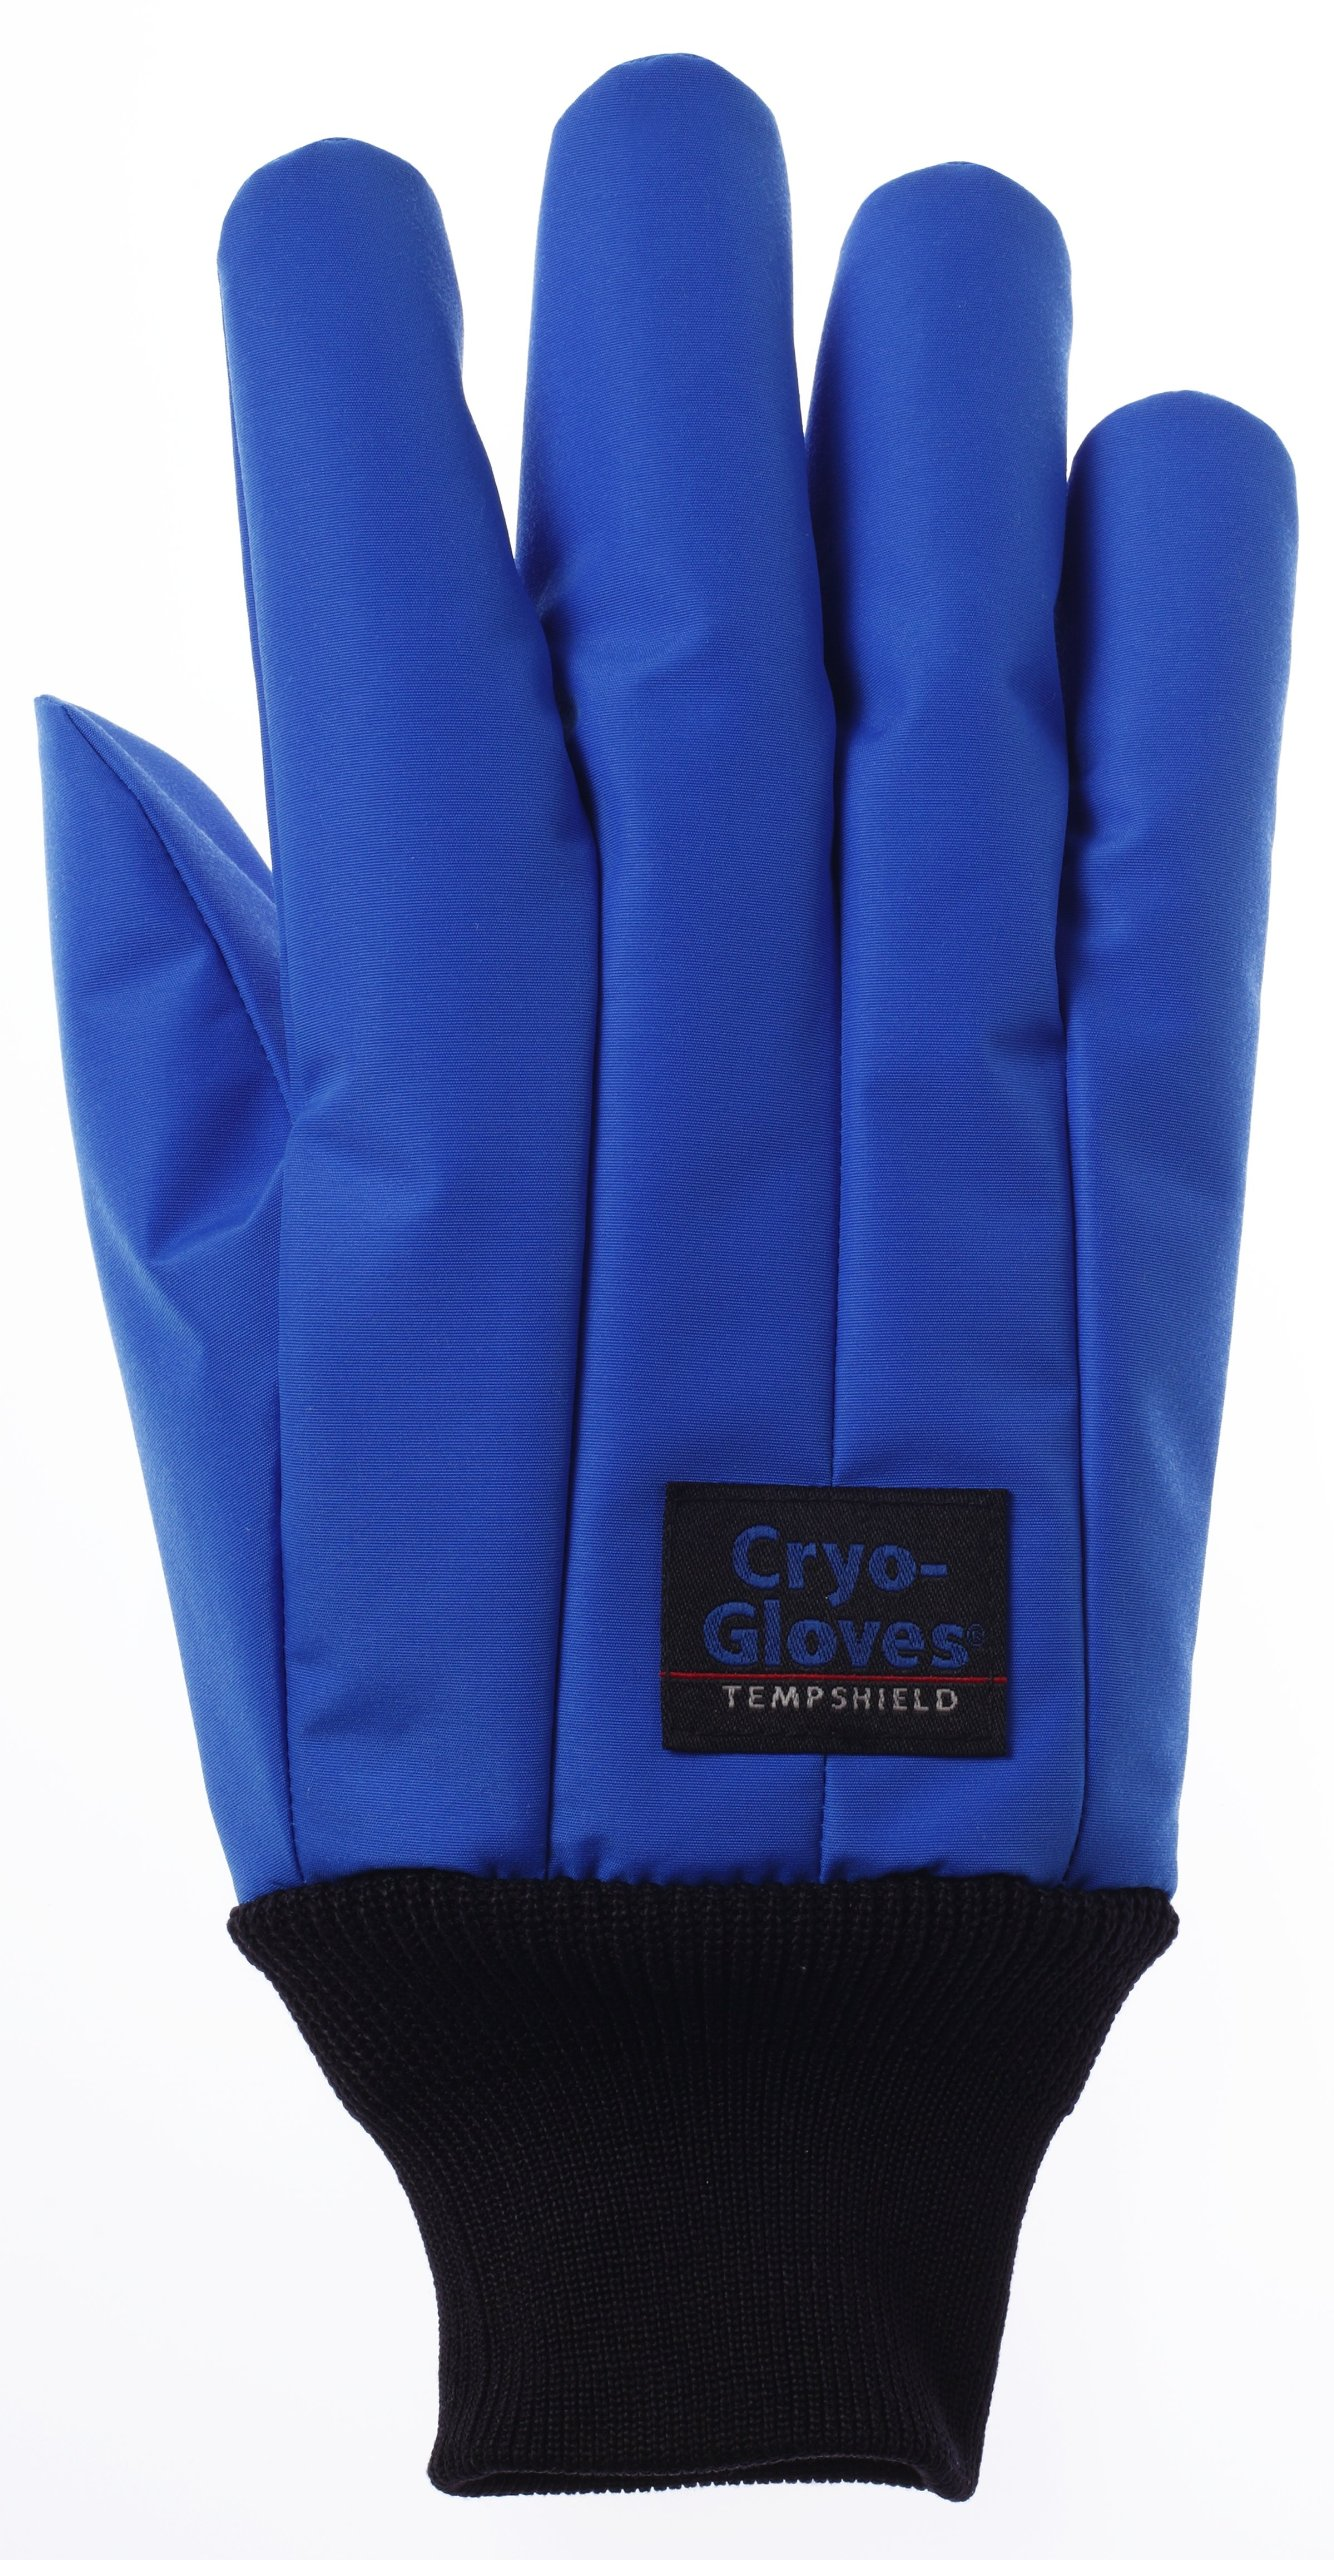 Cryo-Gloves WRM Cryogenic Gloves, Wrist Length, Medium